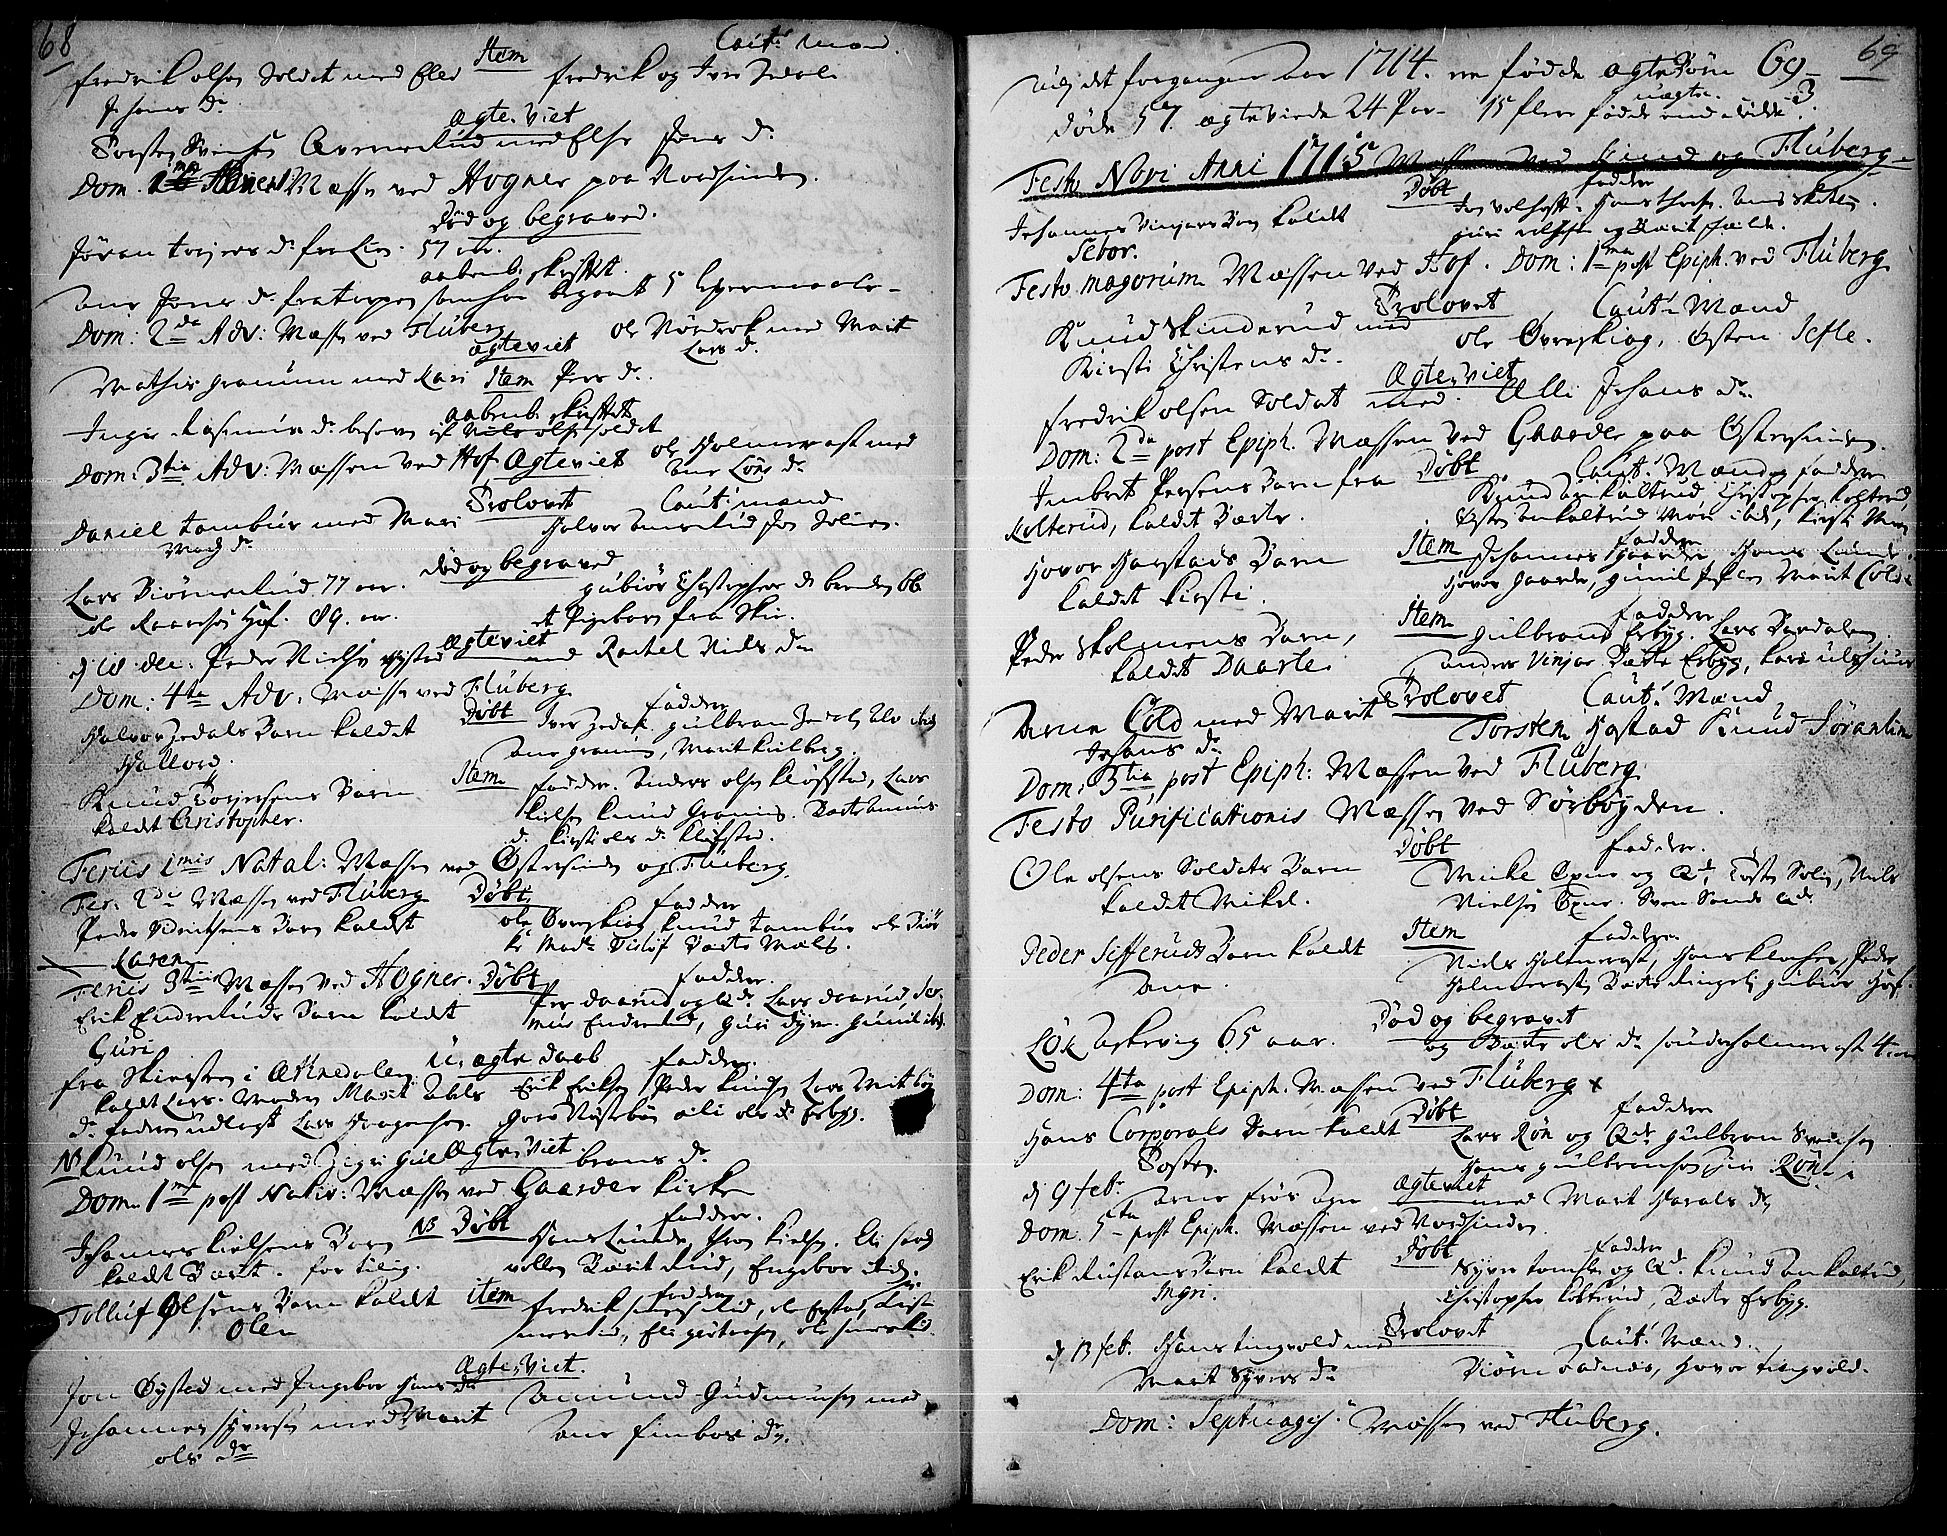 SAH, Land prestekontor, Ministerialbok nr. 1, 1708-1732, s. 68-69